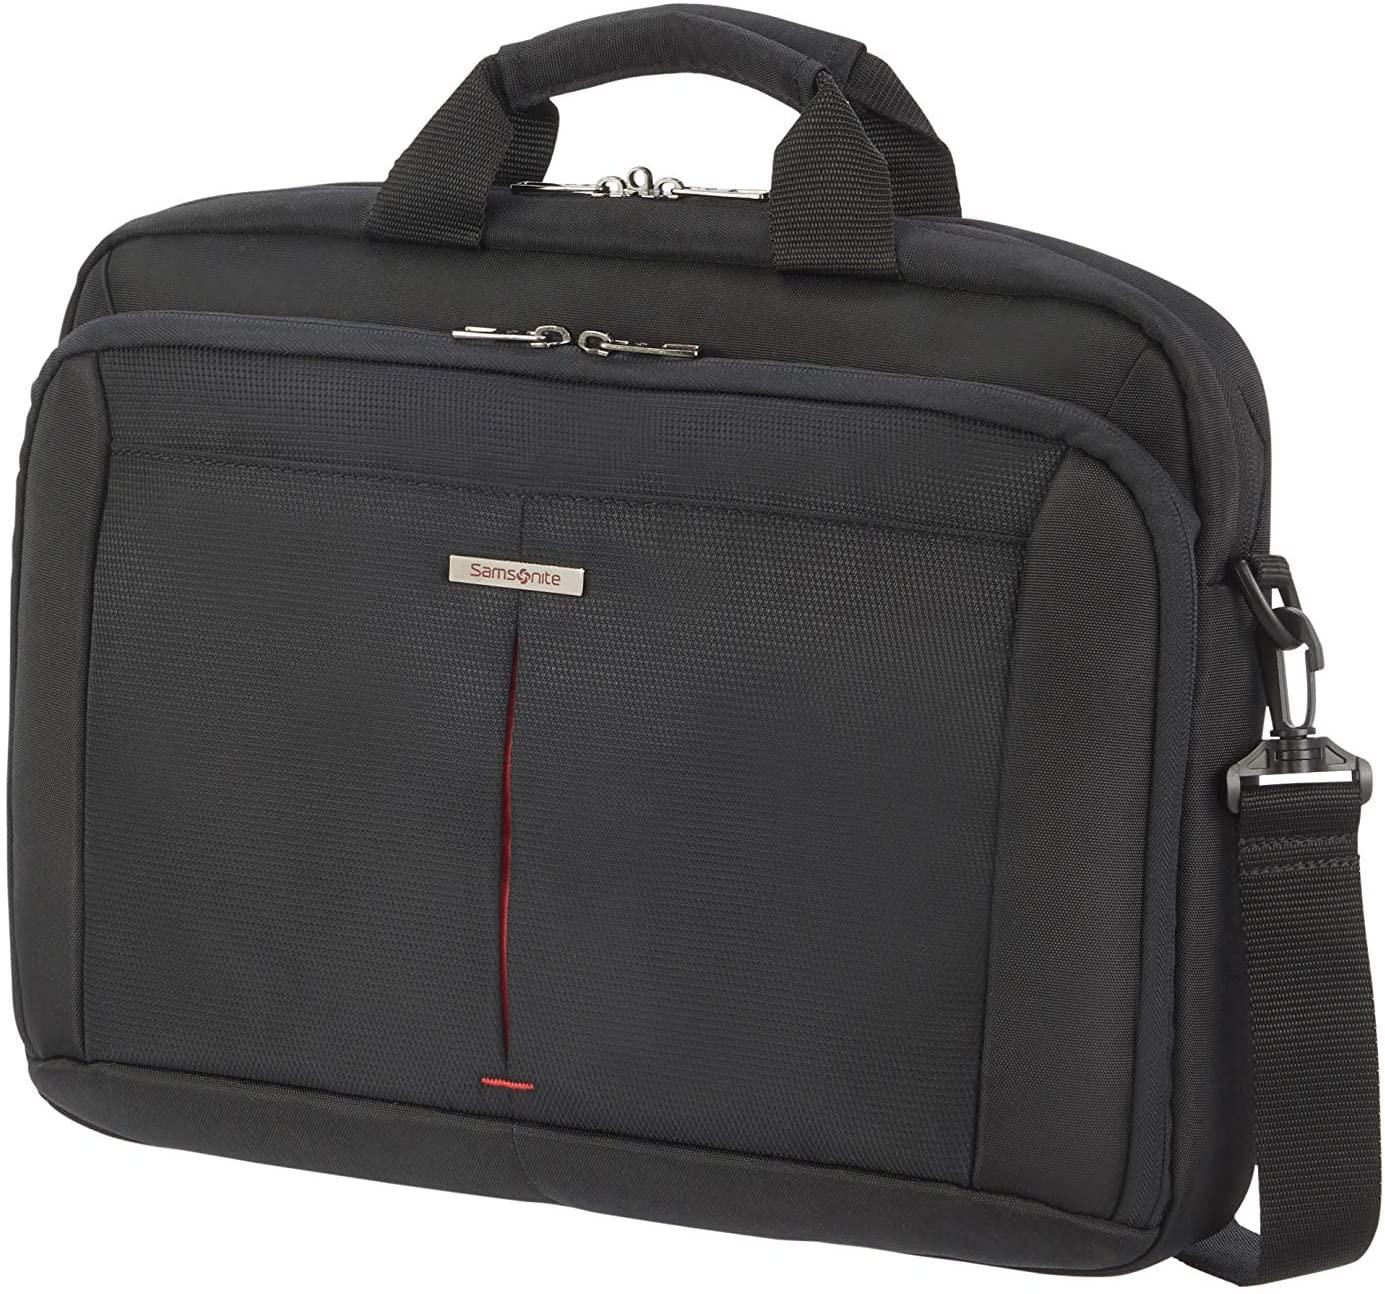 Samsonite Guardit 2.0 - 15.6 Inch Laptop Briefcase, 40 cm, 14.5 Litre, Black at Amazon for £25